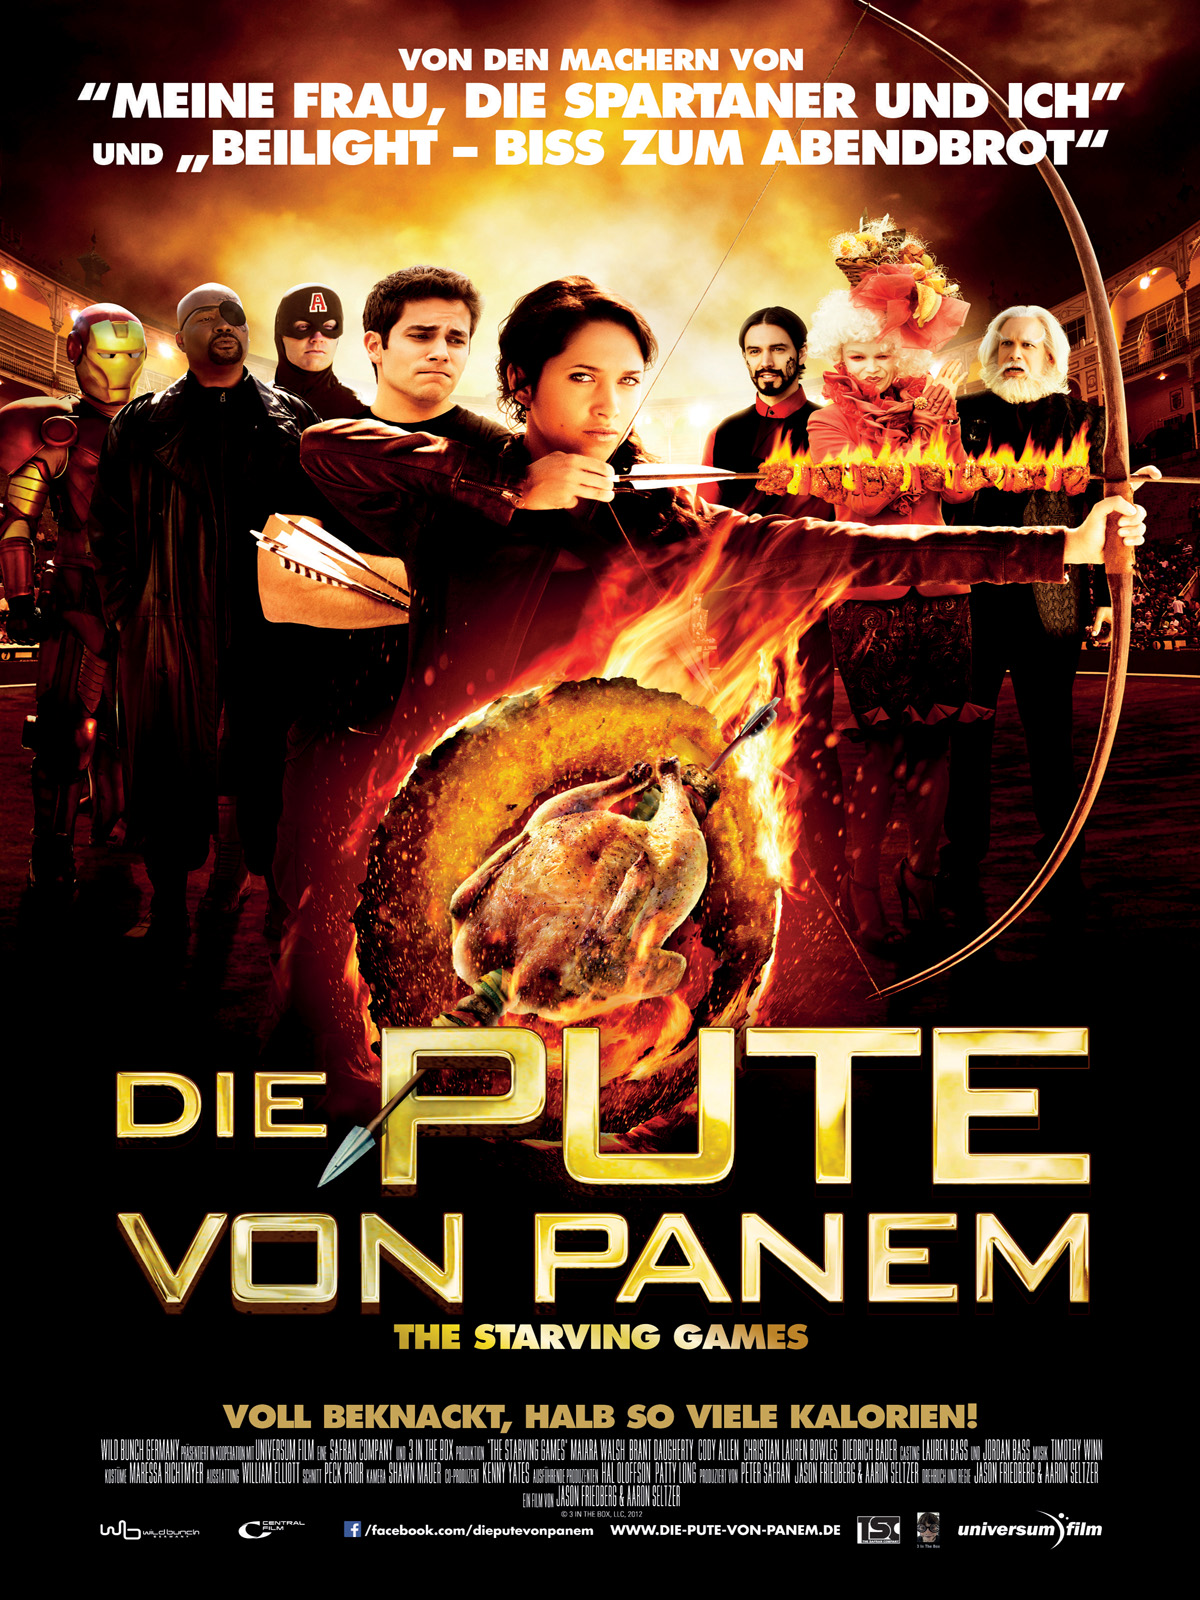 Die pute von panem the starving games film 2013 for Die tribute von panem film